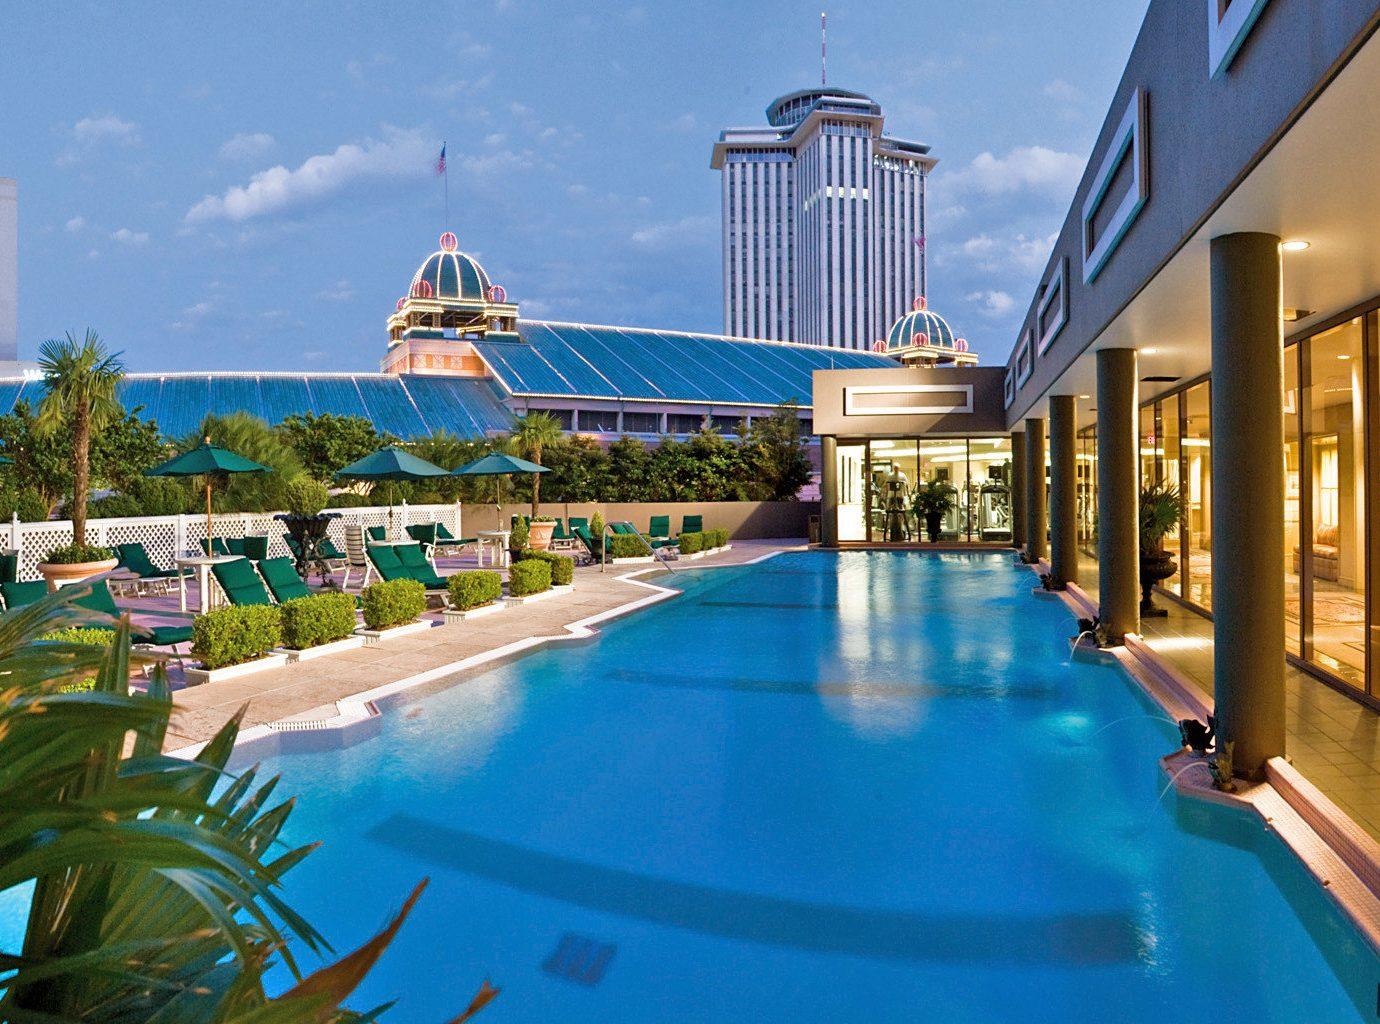 Hotels leisure swimming pool Resort property Pool Water park vacation estate amusement park condominium blue swimming